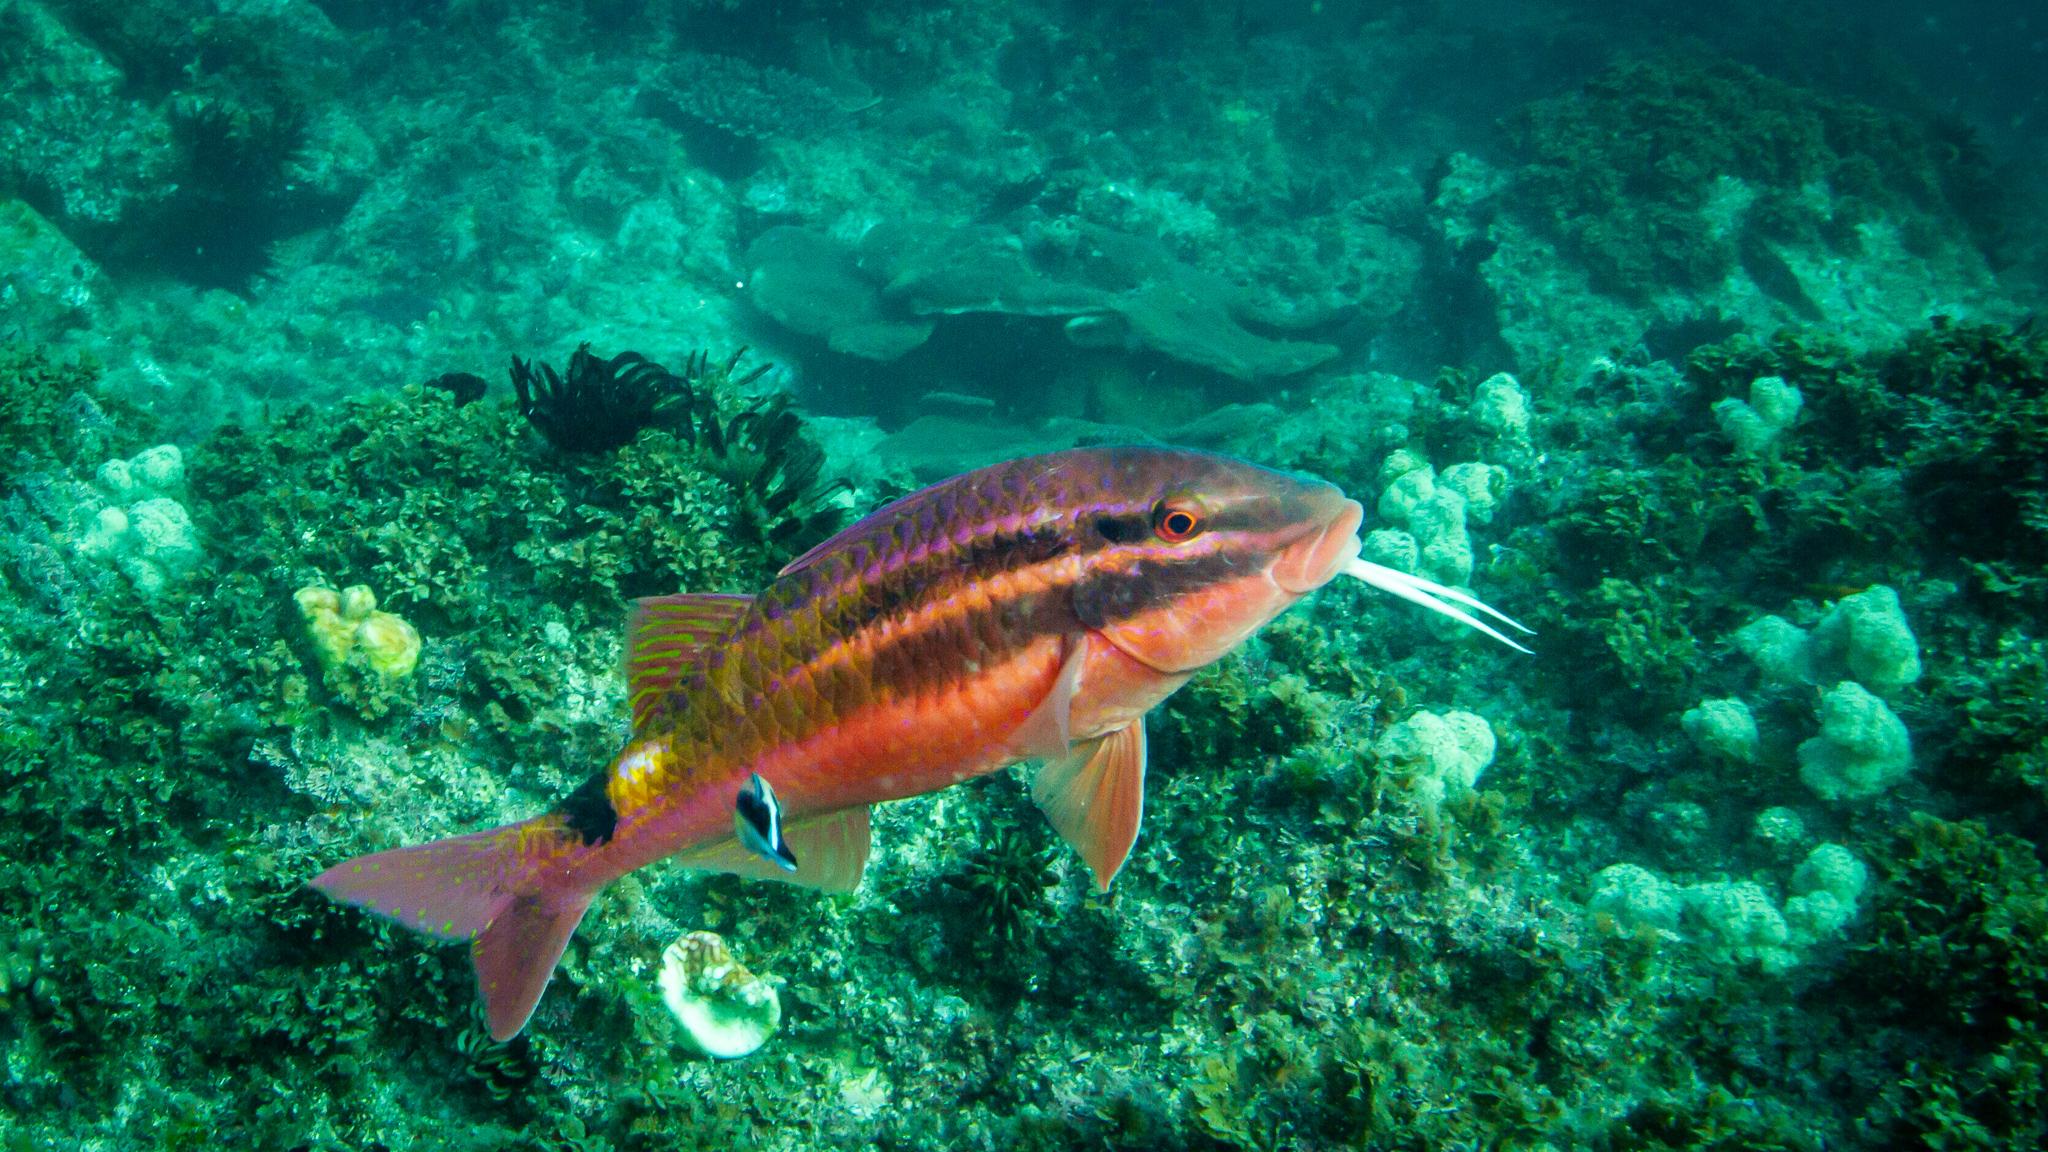 Scuba Diver Julian Rocks NSW Australia